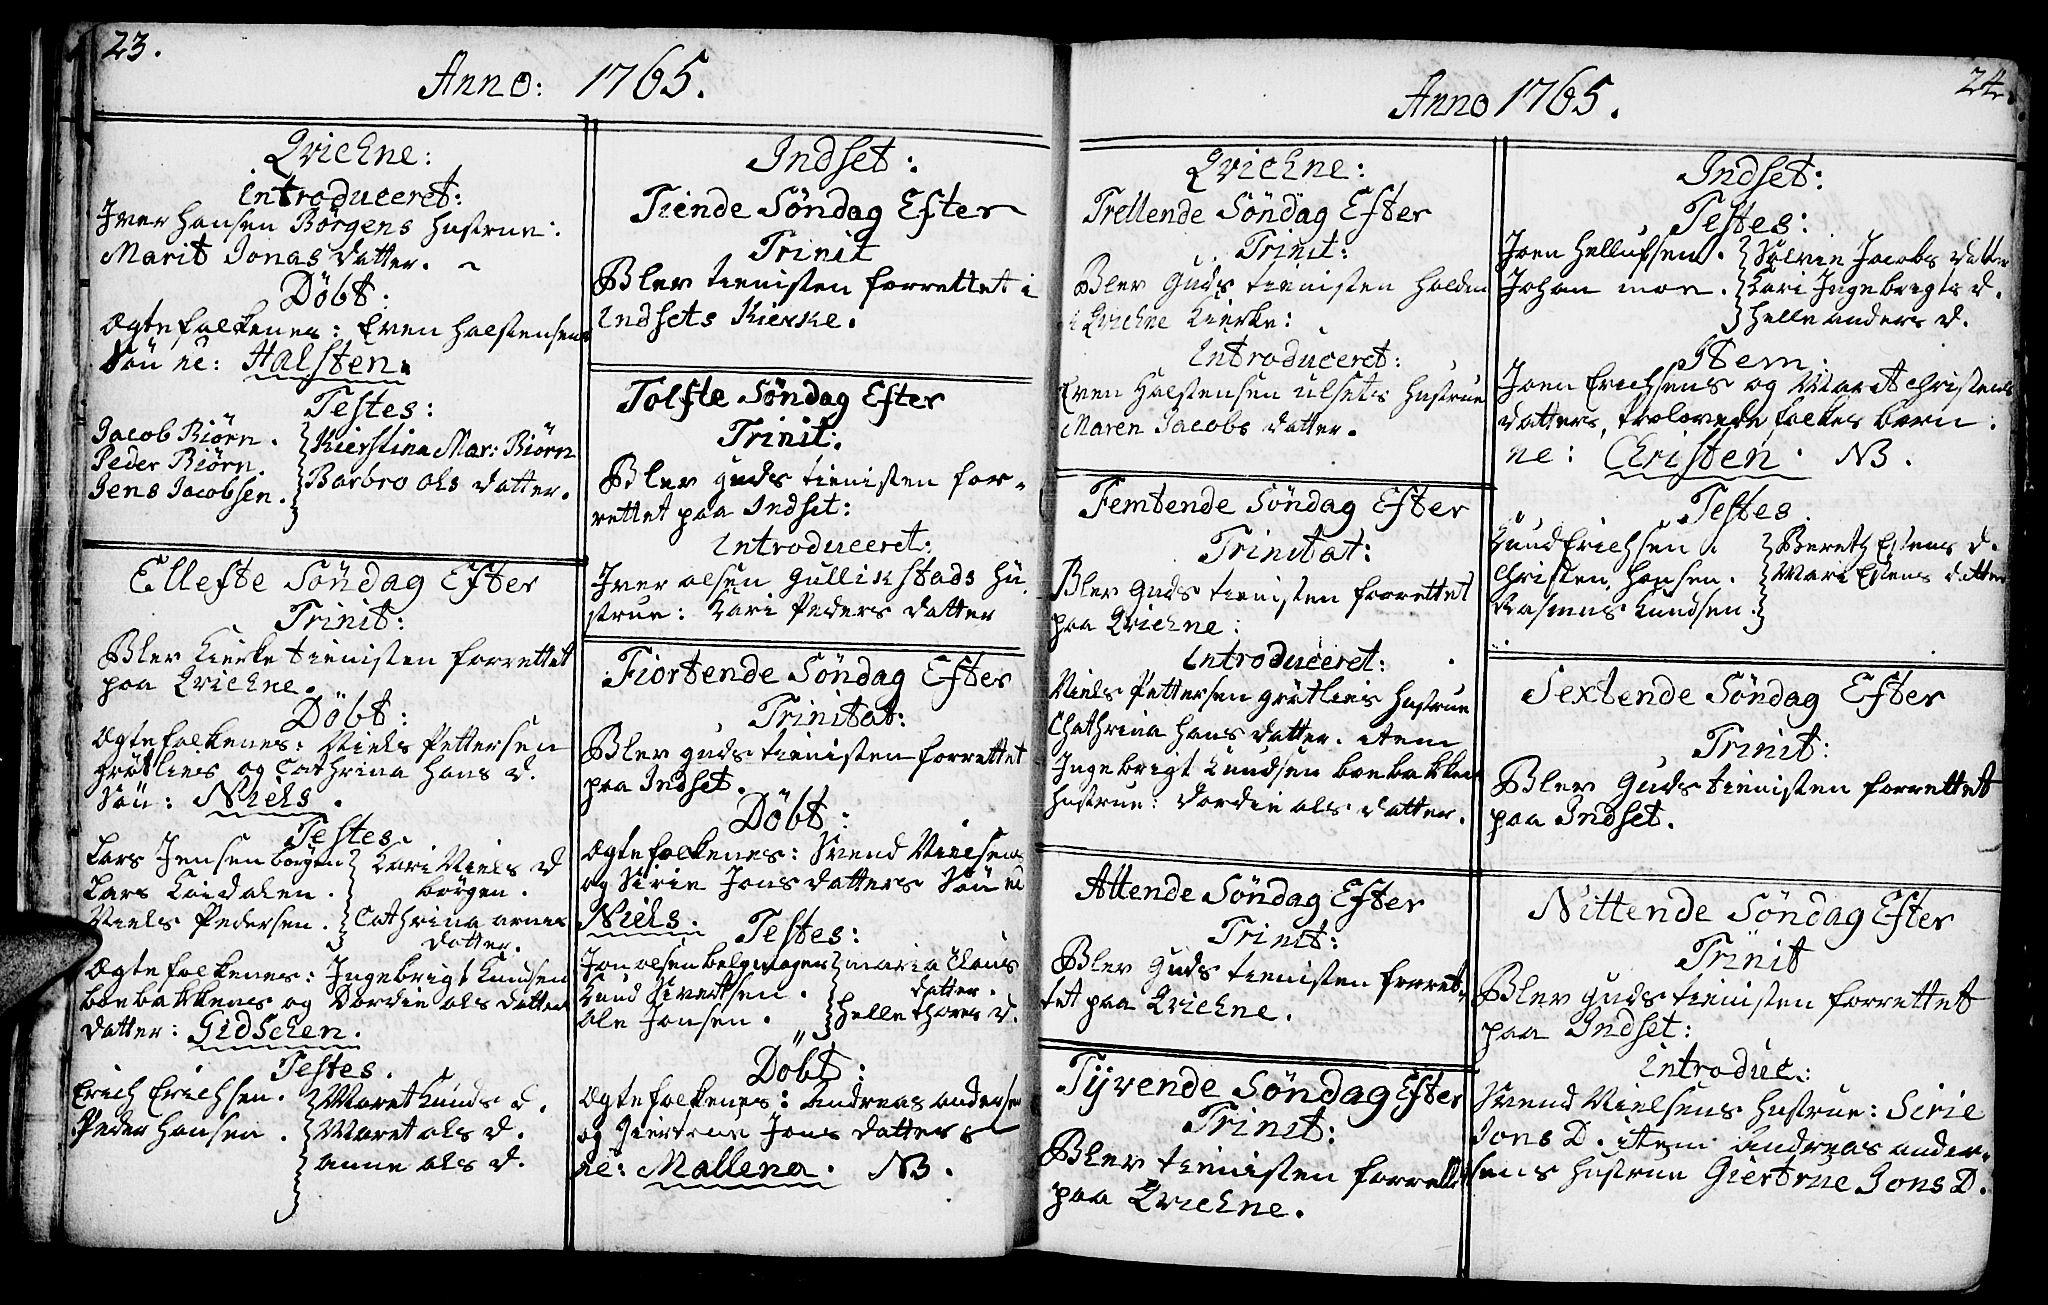 SAH, Kvikne prestekontor, Ministerialbok nr. 2, 1764-1784, s. 23-24